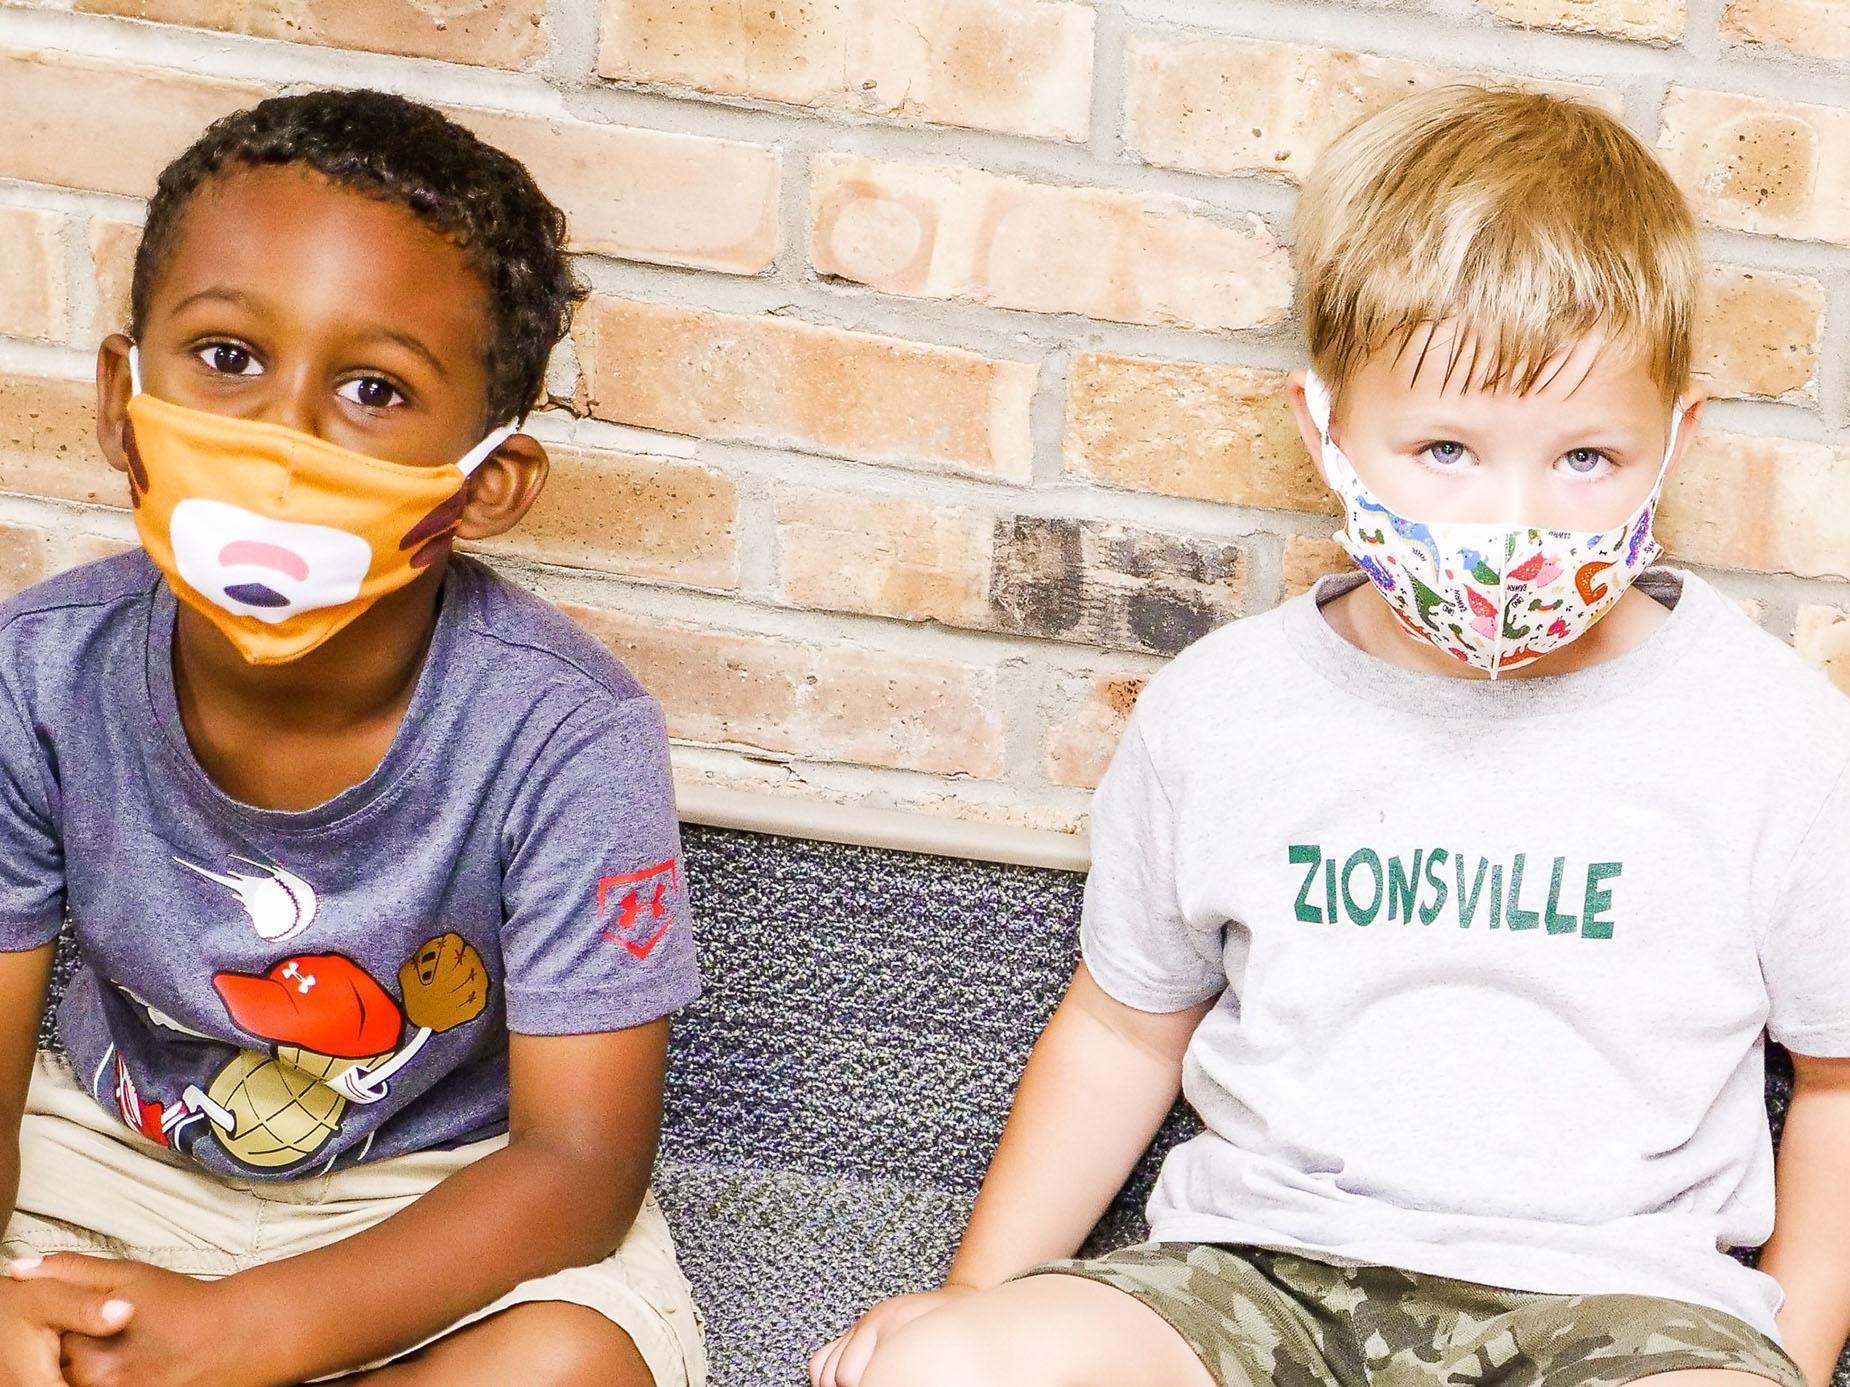 About Zionsville Community Schools